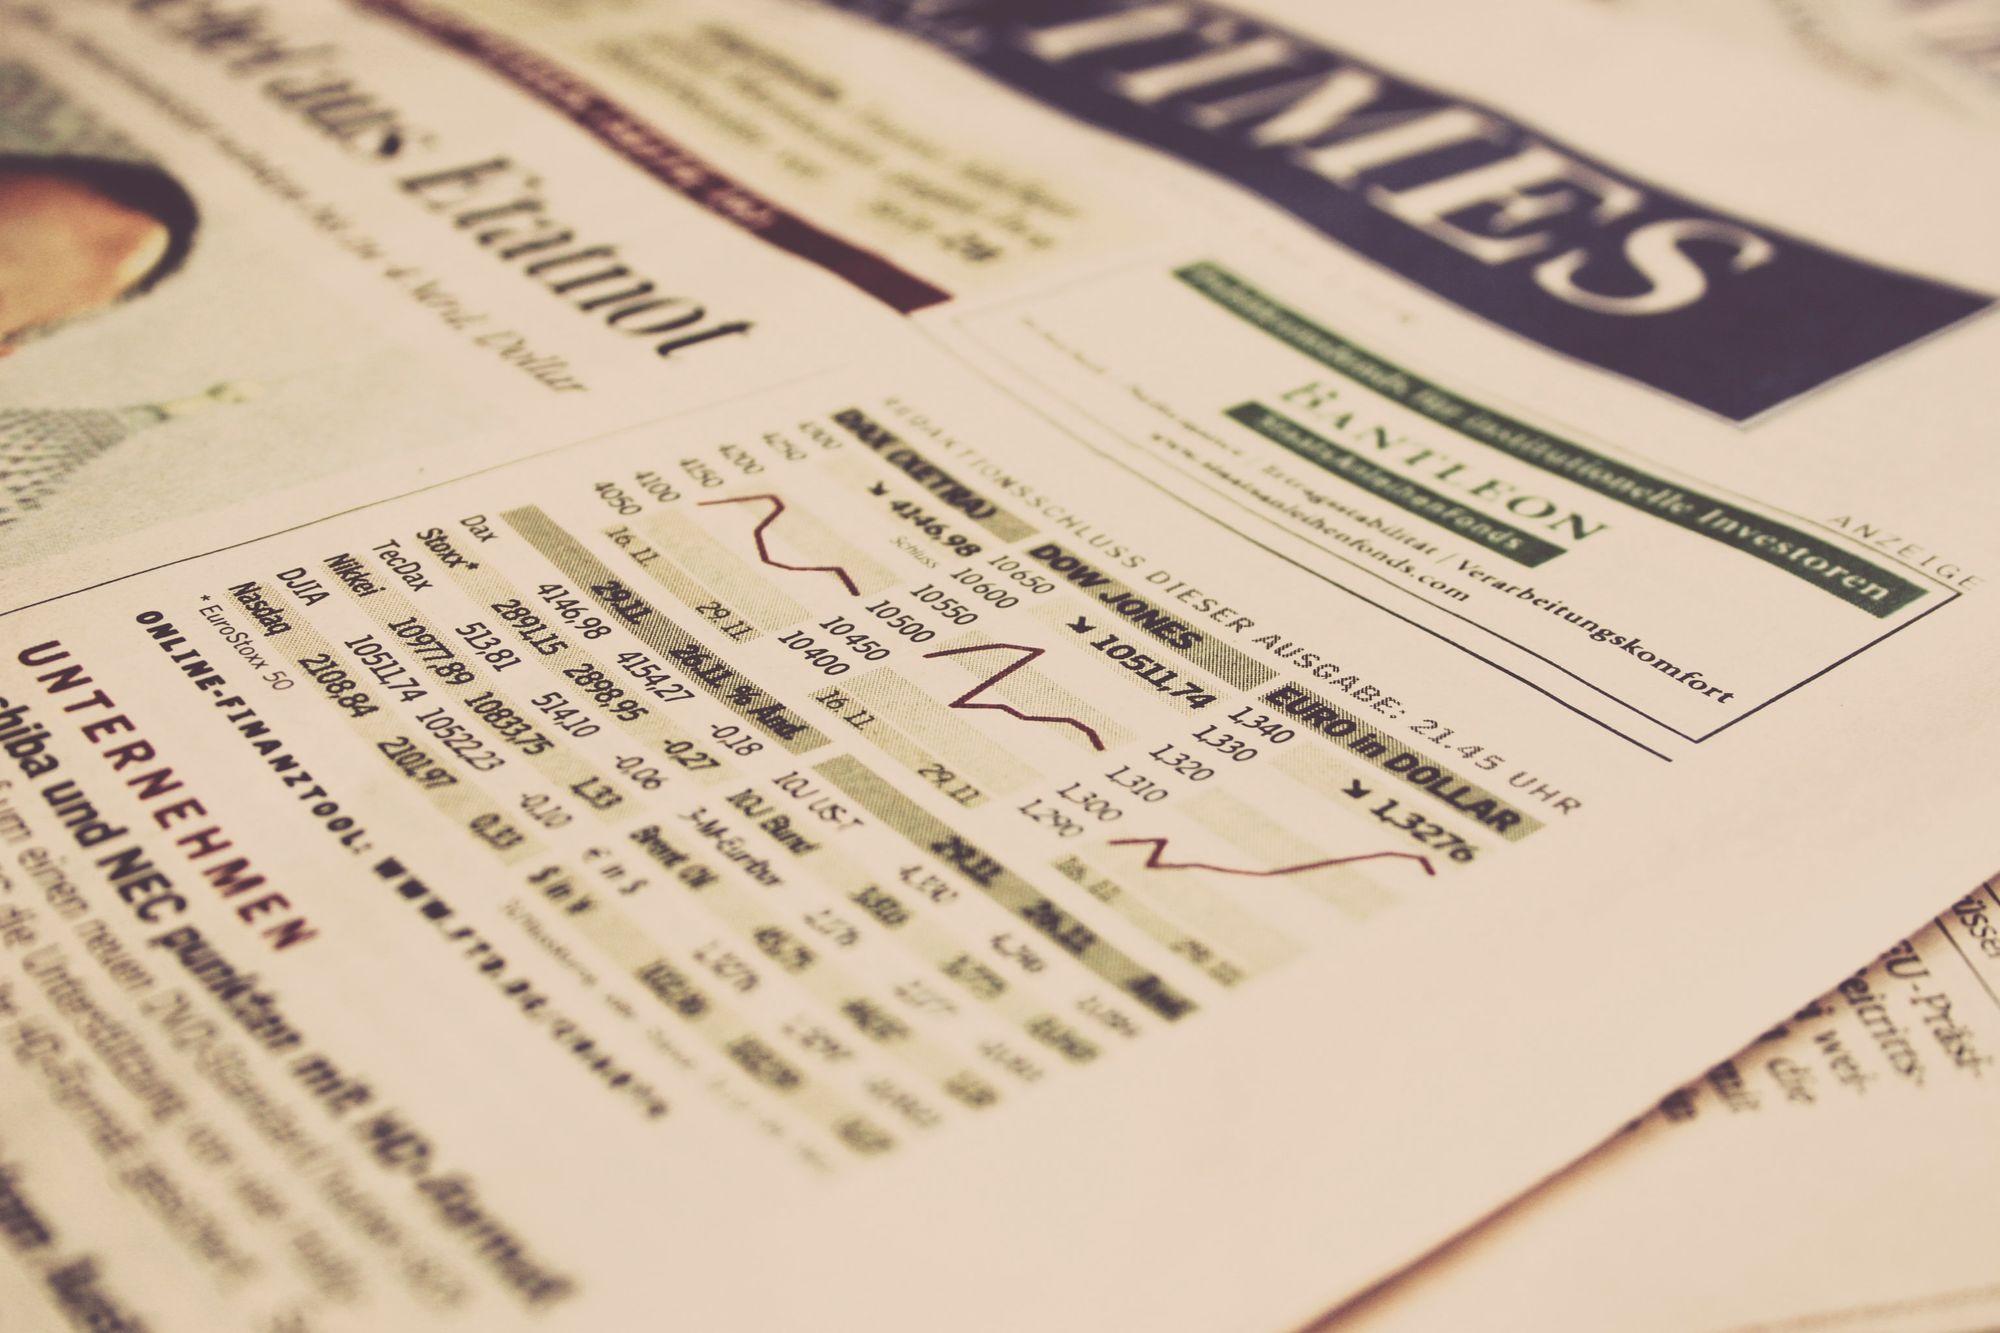 Litigation Finance Industry Outlook: Q1 2020